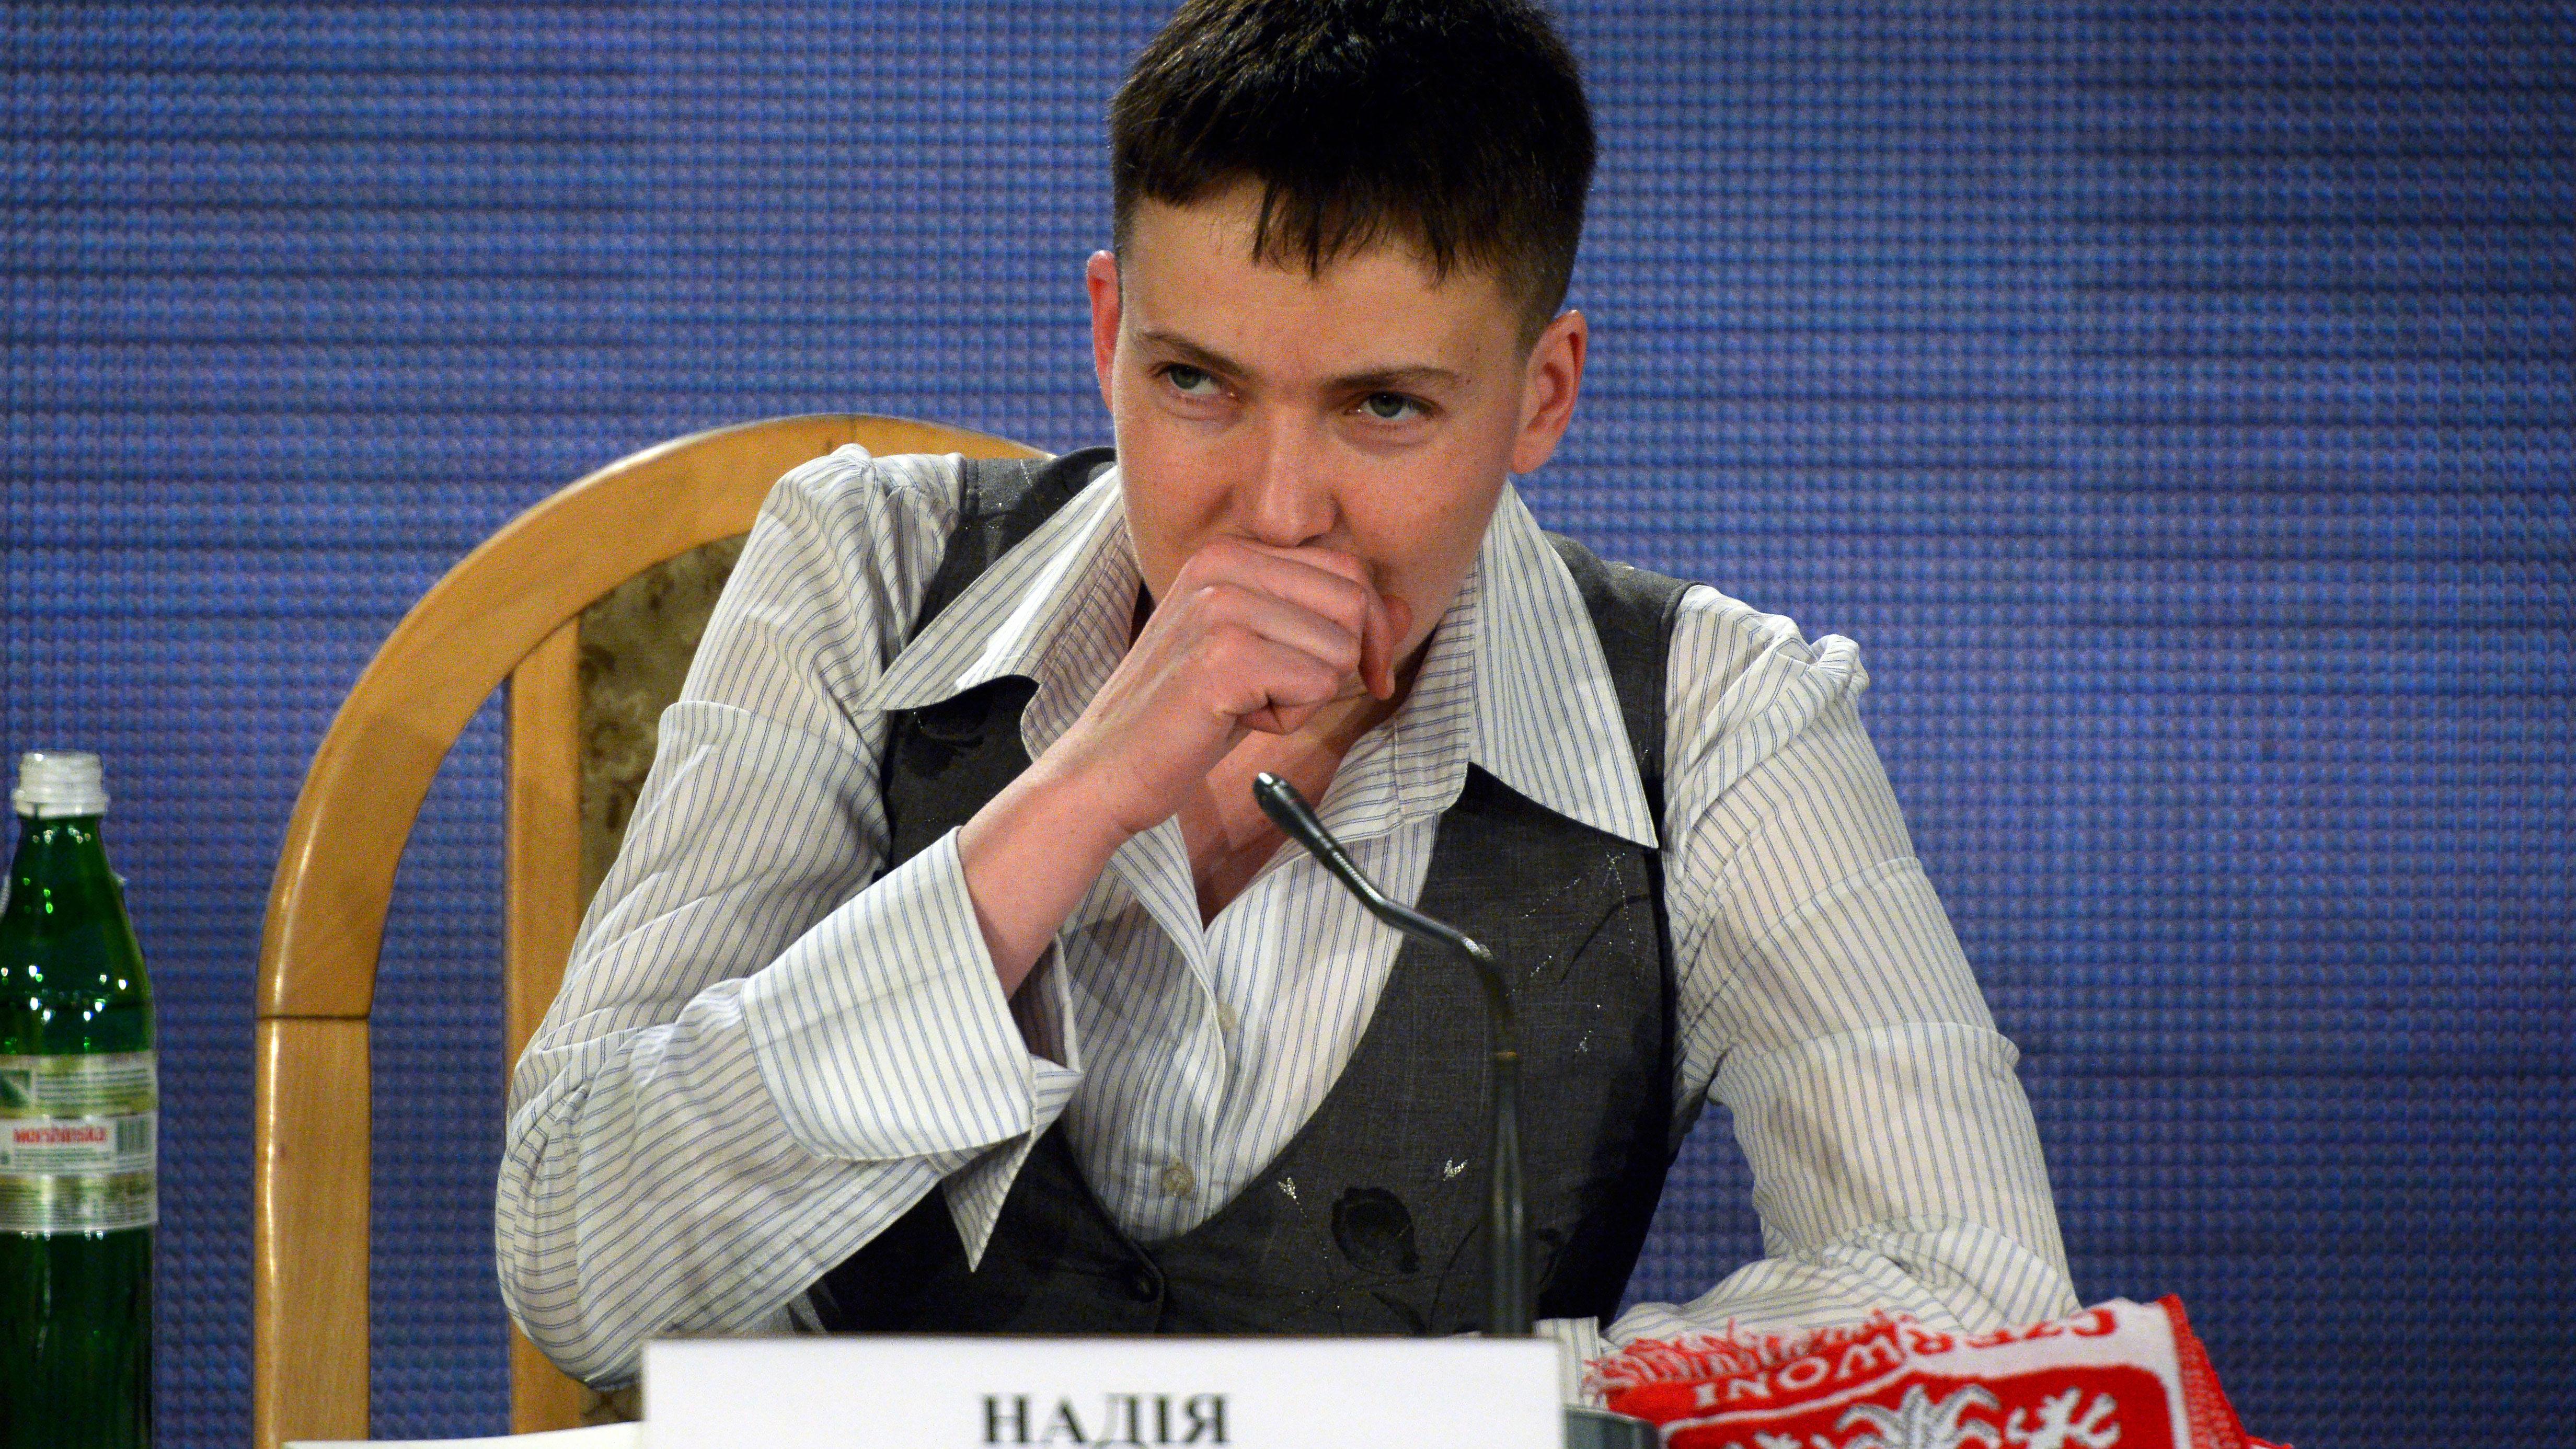 "<p class=""p1"">Фото: &copy; РИА Новости /&nbsp;Алексей Вовк</p>"